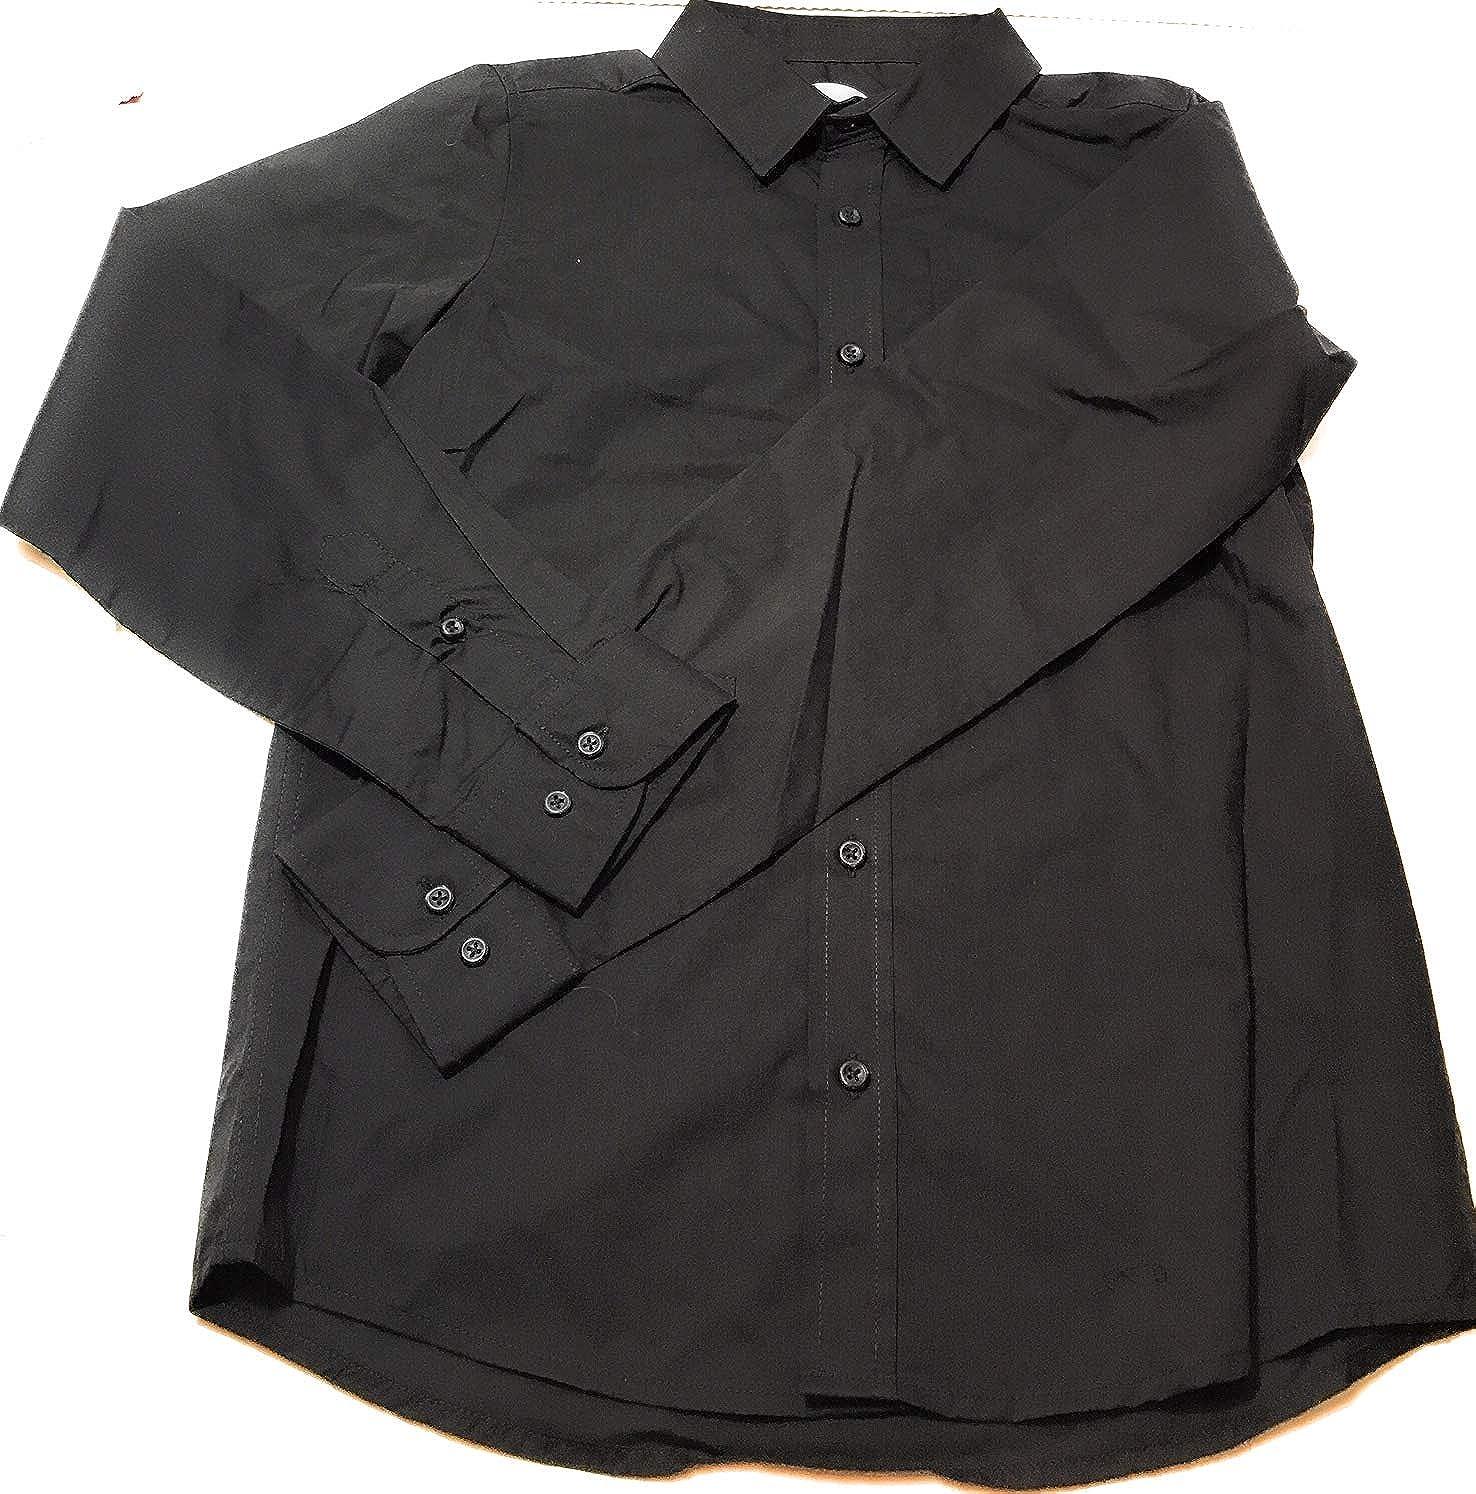 Boys Long Sleeve Black Dress Shirt for School Uniform or Party Size 14-16 Large